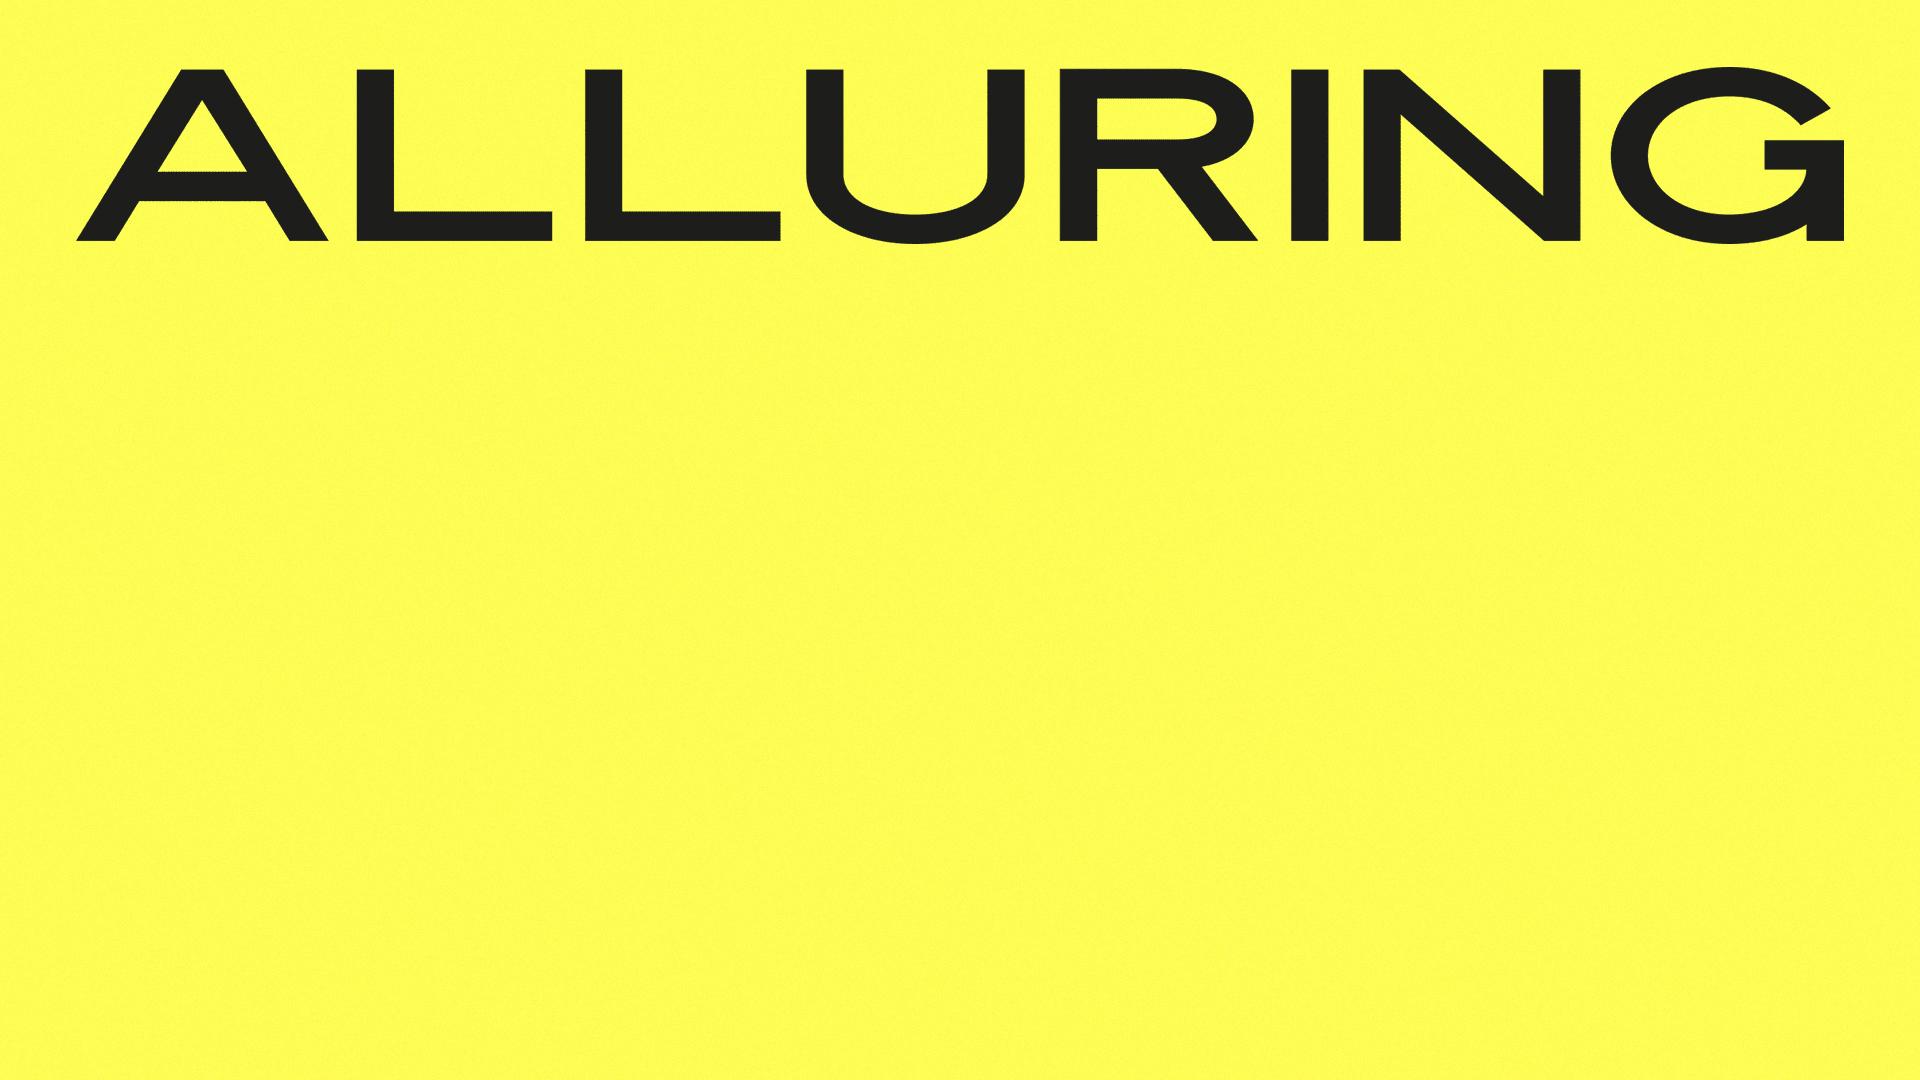 alluring-logo-yoenpaperland